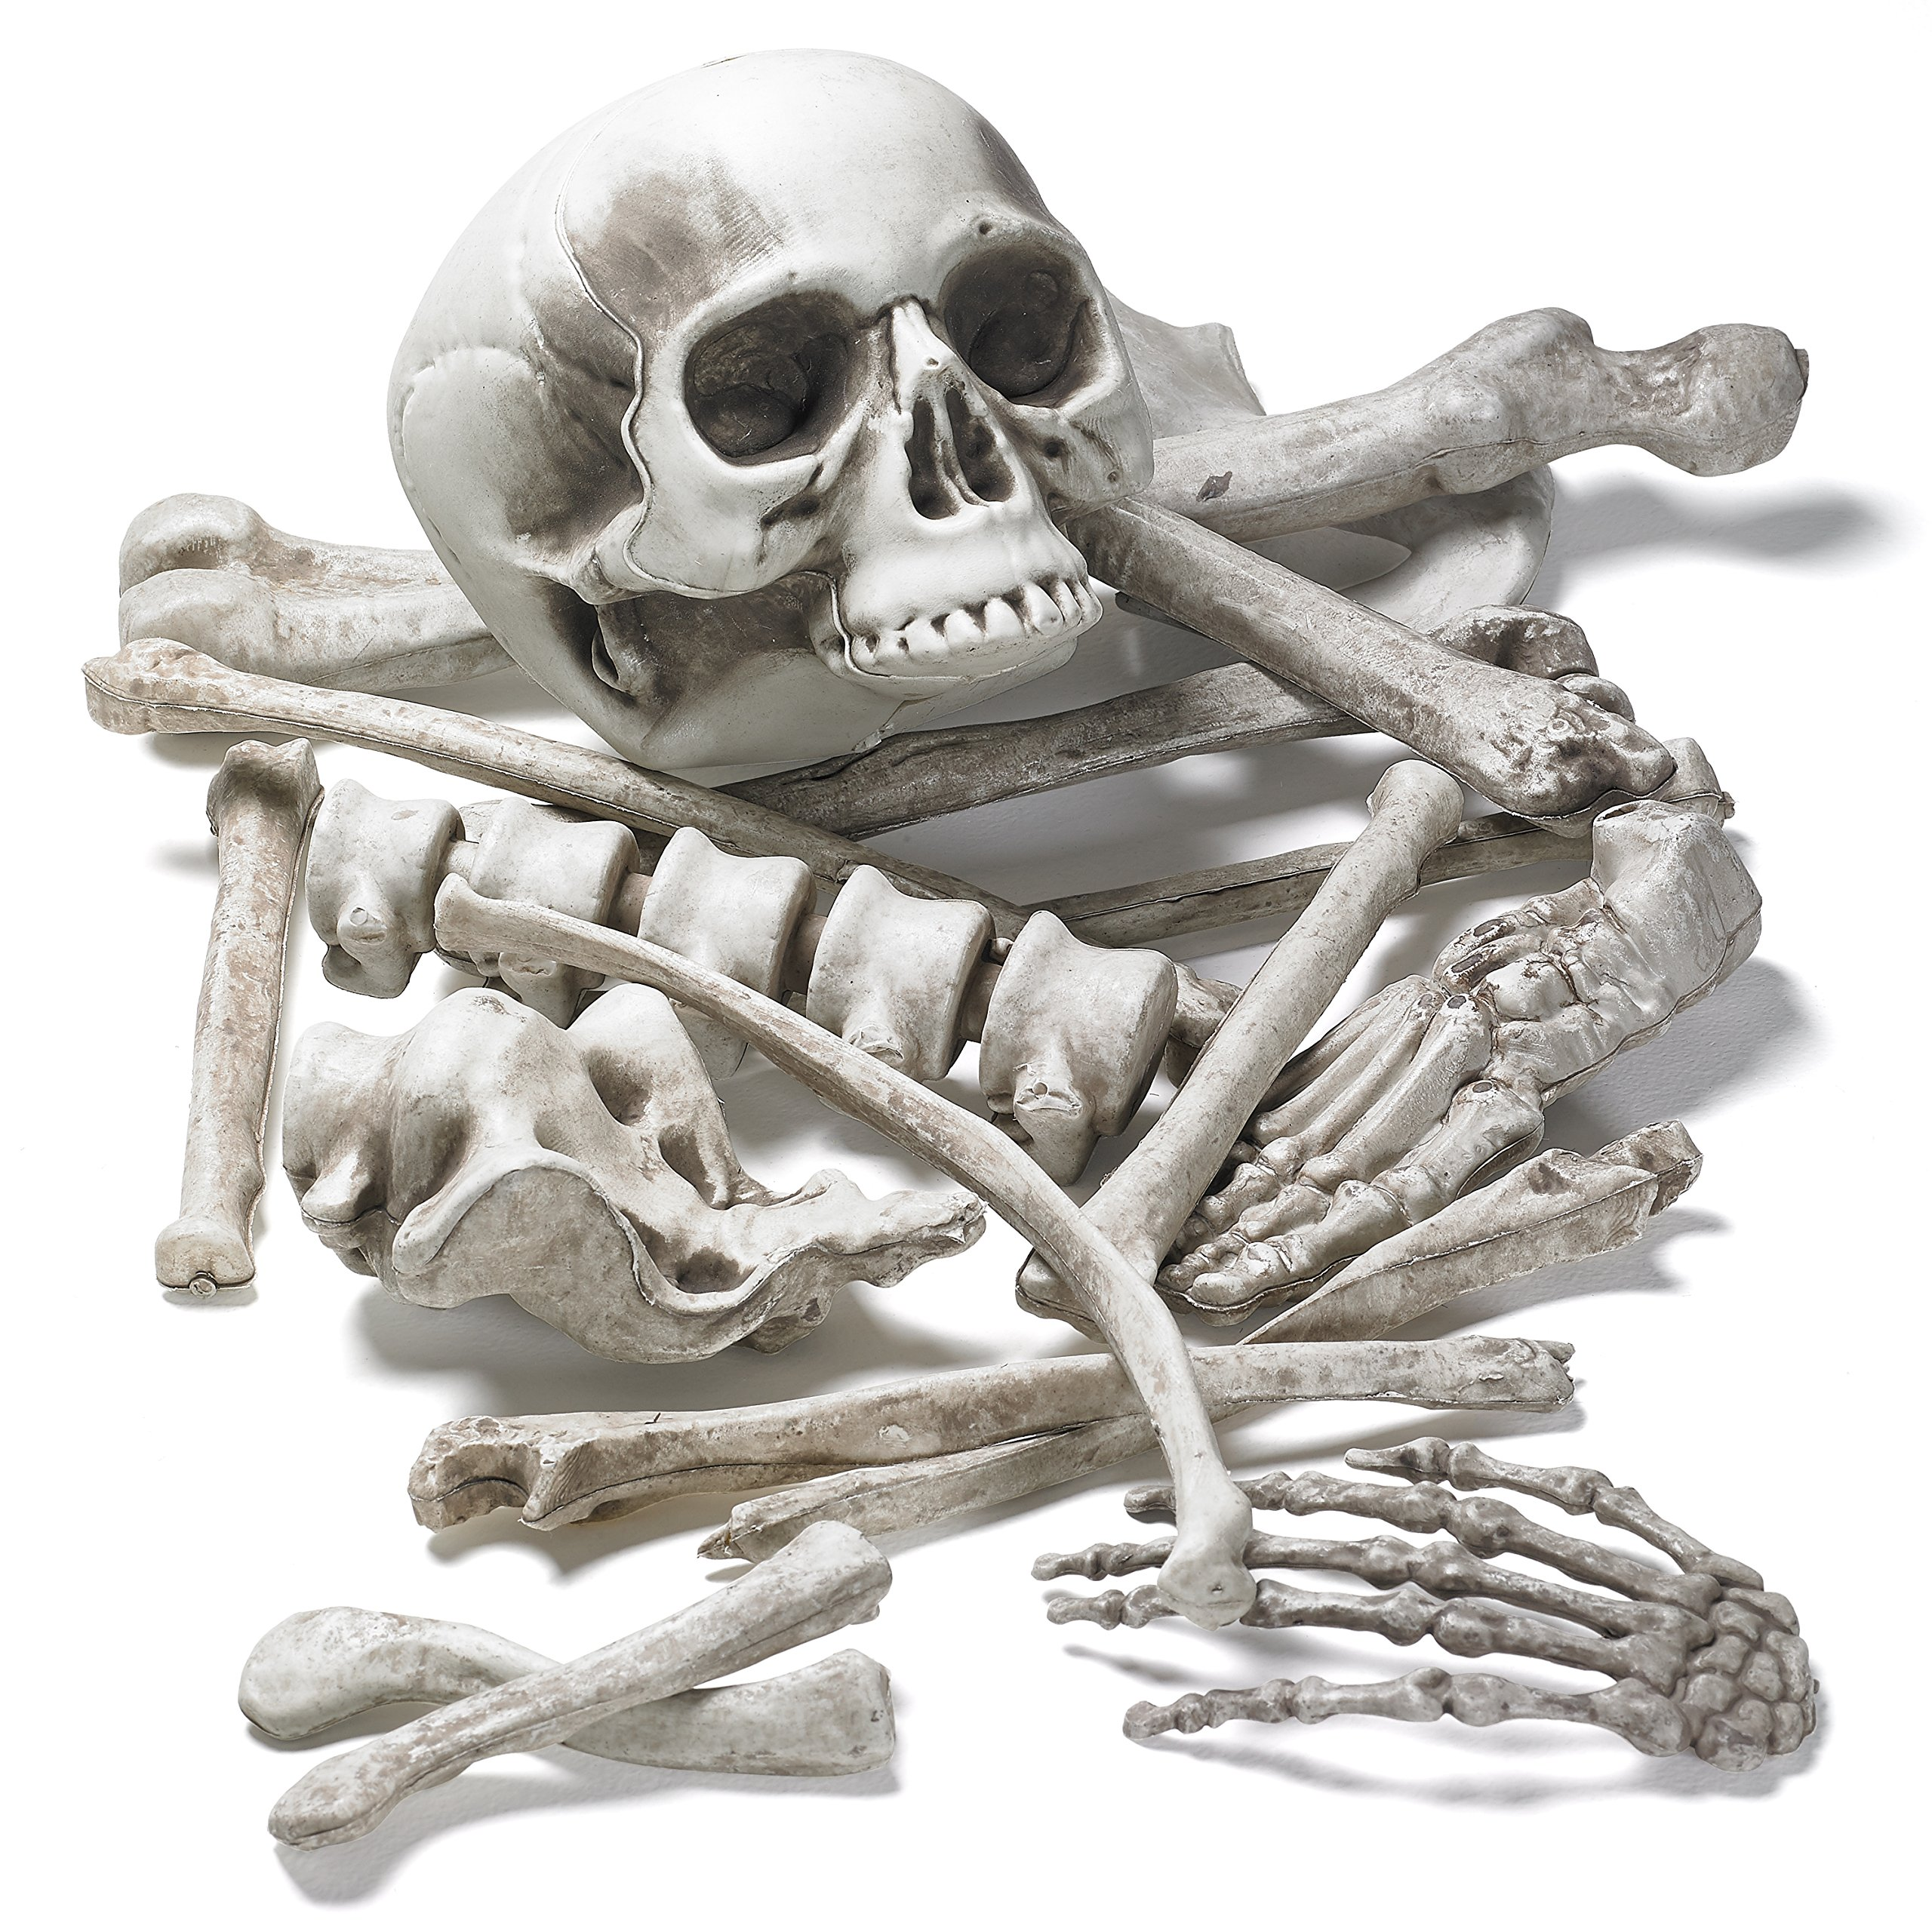 Prextex Bag of Skeleton Bones and Skull for Best Halloween Decoration and Spookiest Graveyard Scene